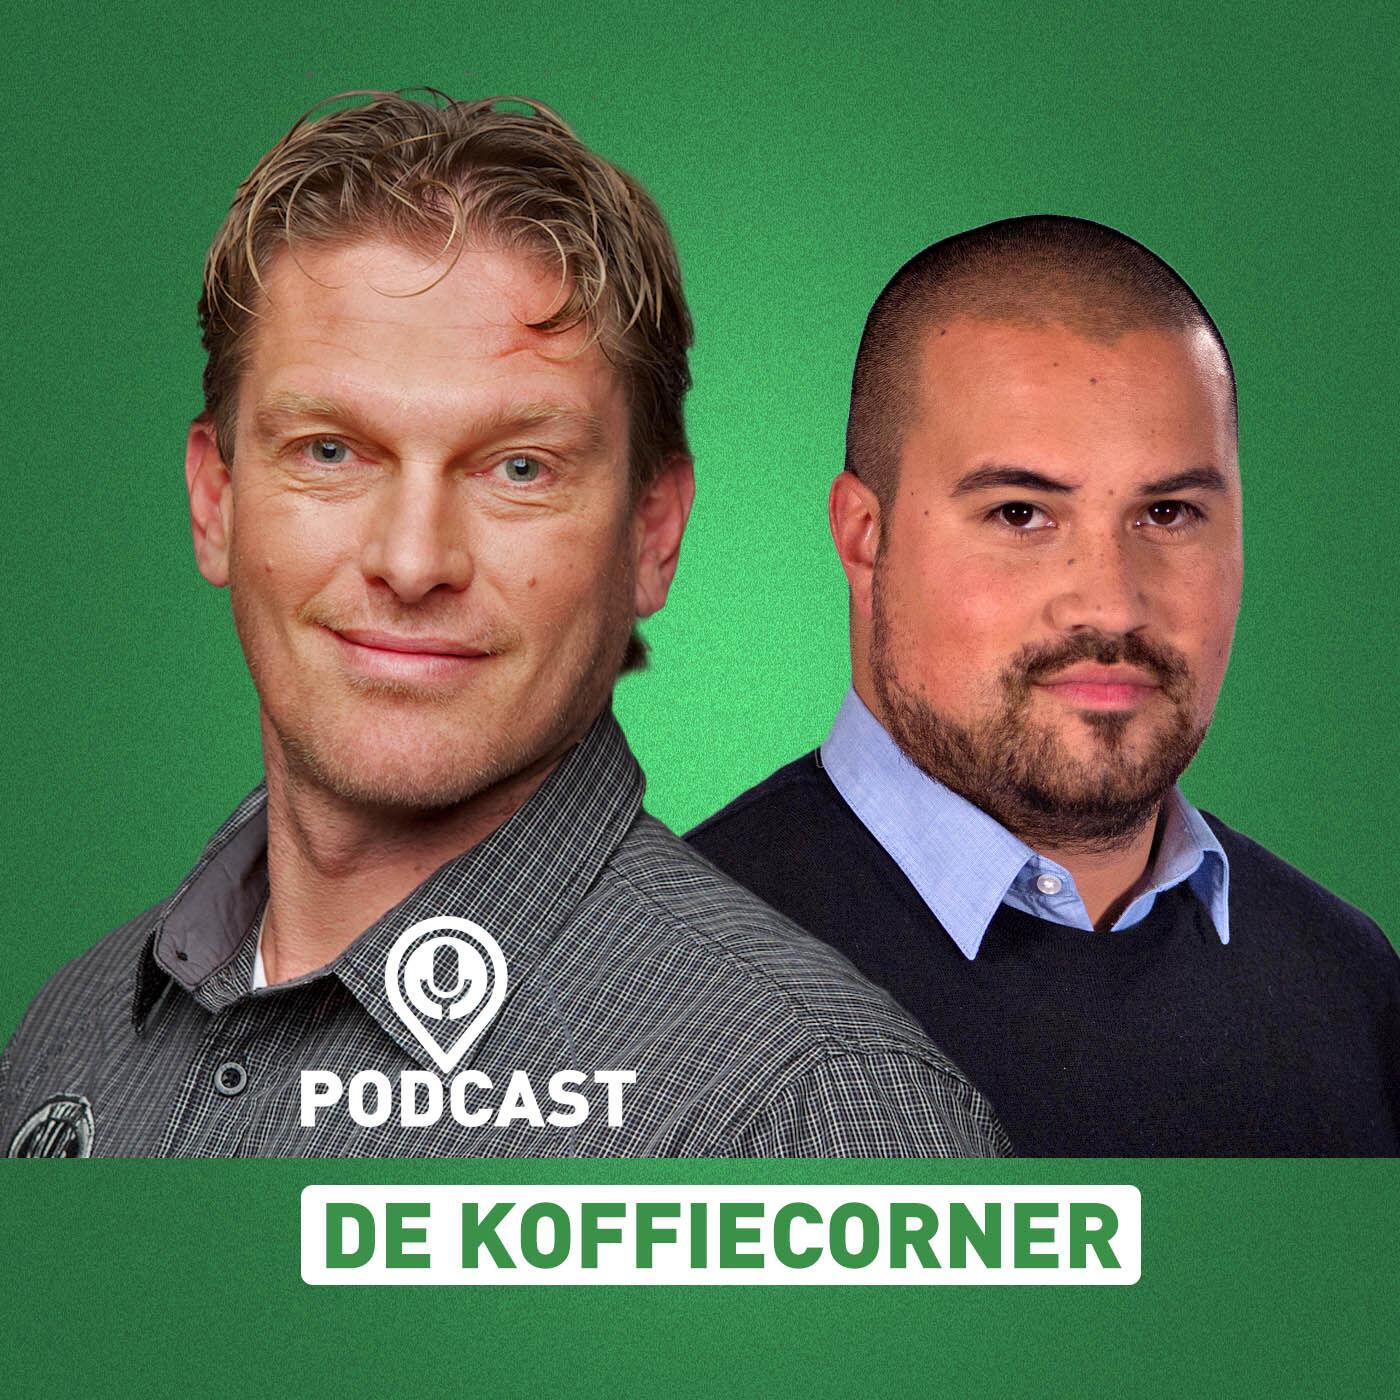 De Koffiecorner #17: Coach Taaij wil dat Lycurgus transparanter is over financiën